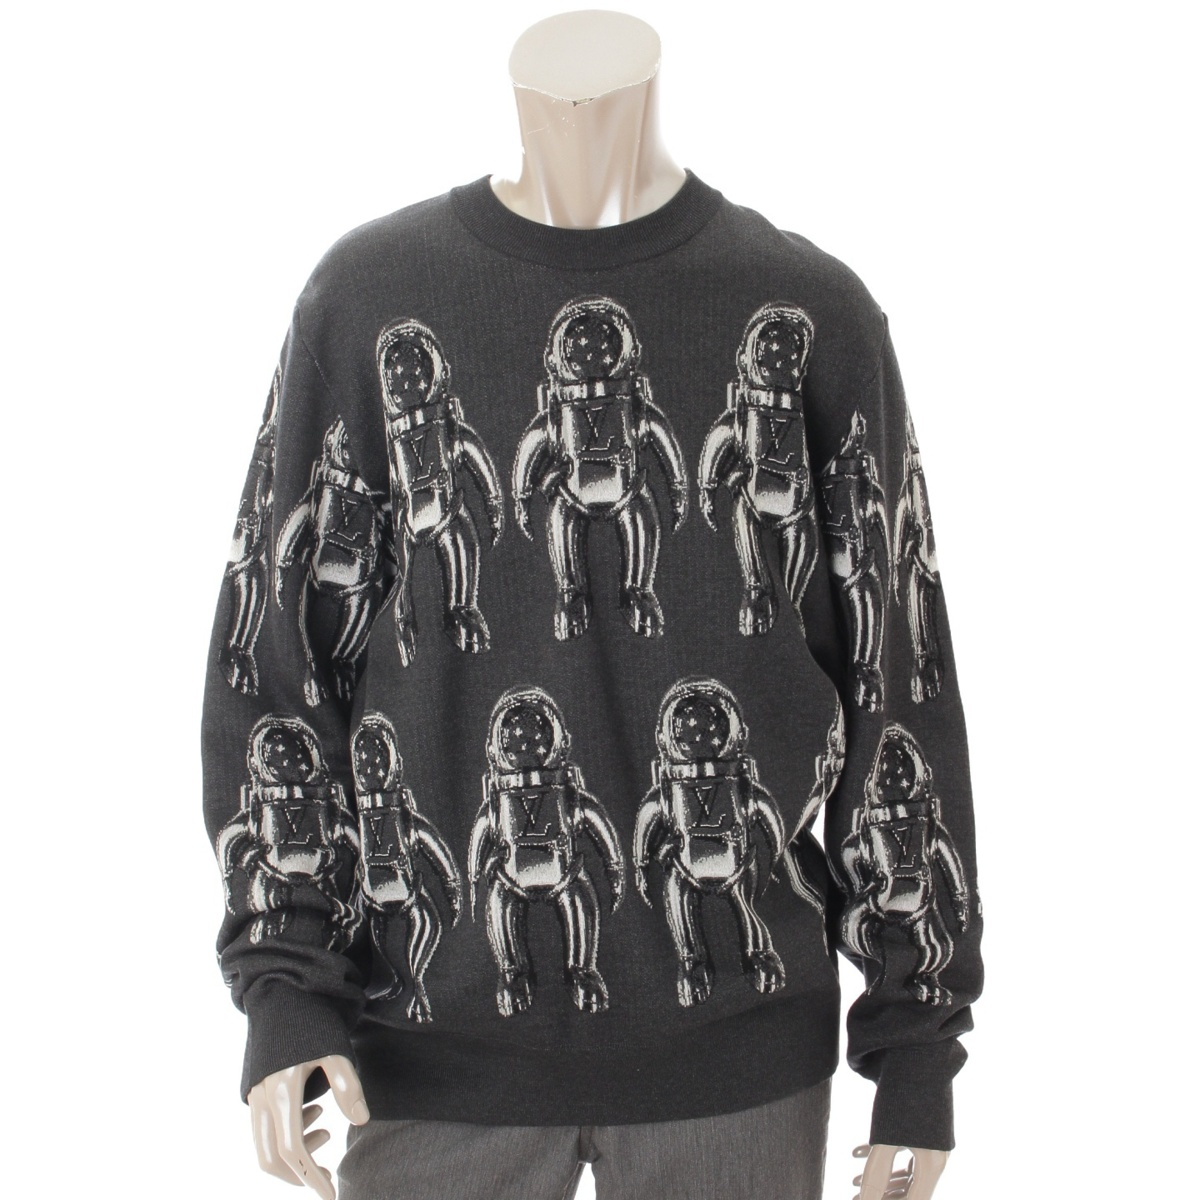 【20%OFFセール】【ルイヴィトン】Louis Vuitton 19SS メンズ スペースマン ニット トップス セーター グレー XL 【中古】【鑑定済・正規品保証】68592